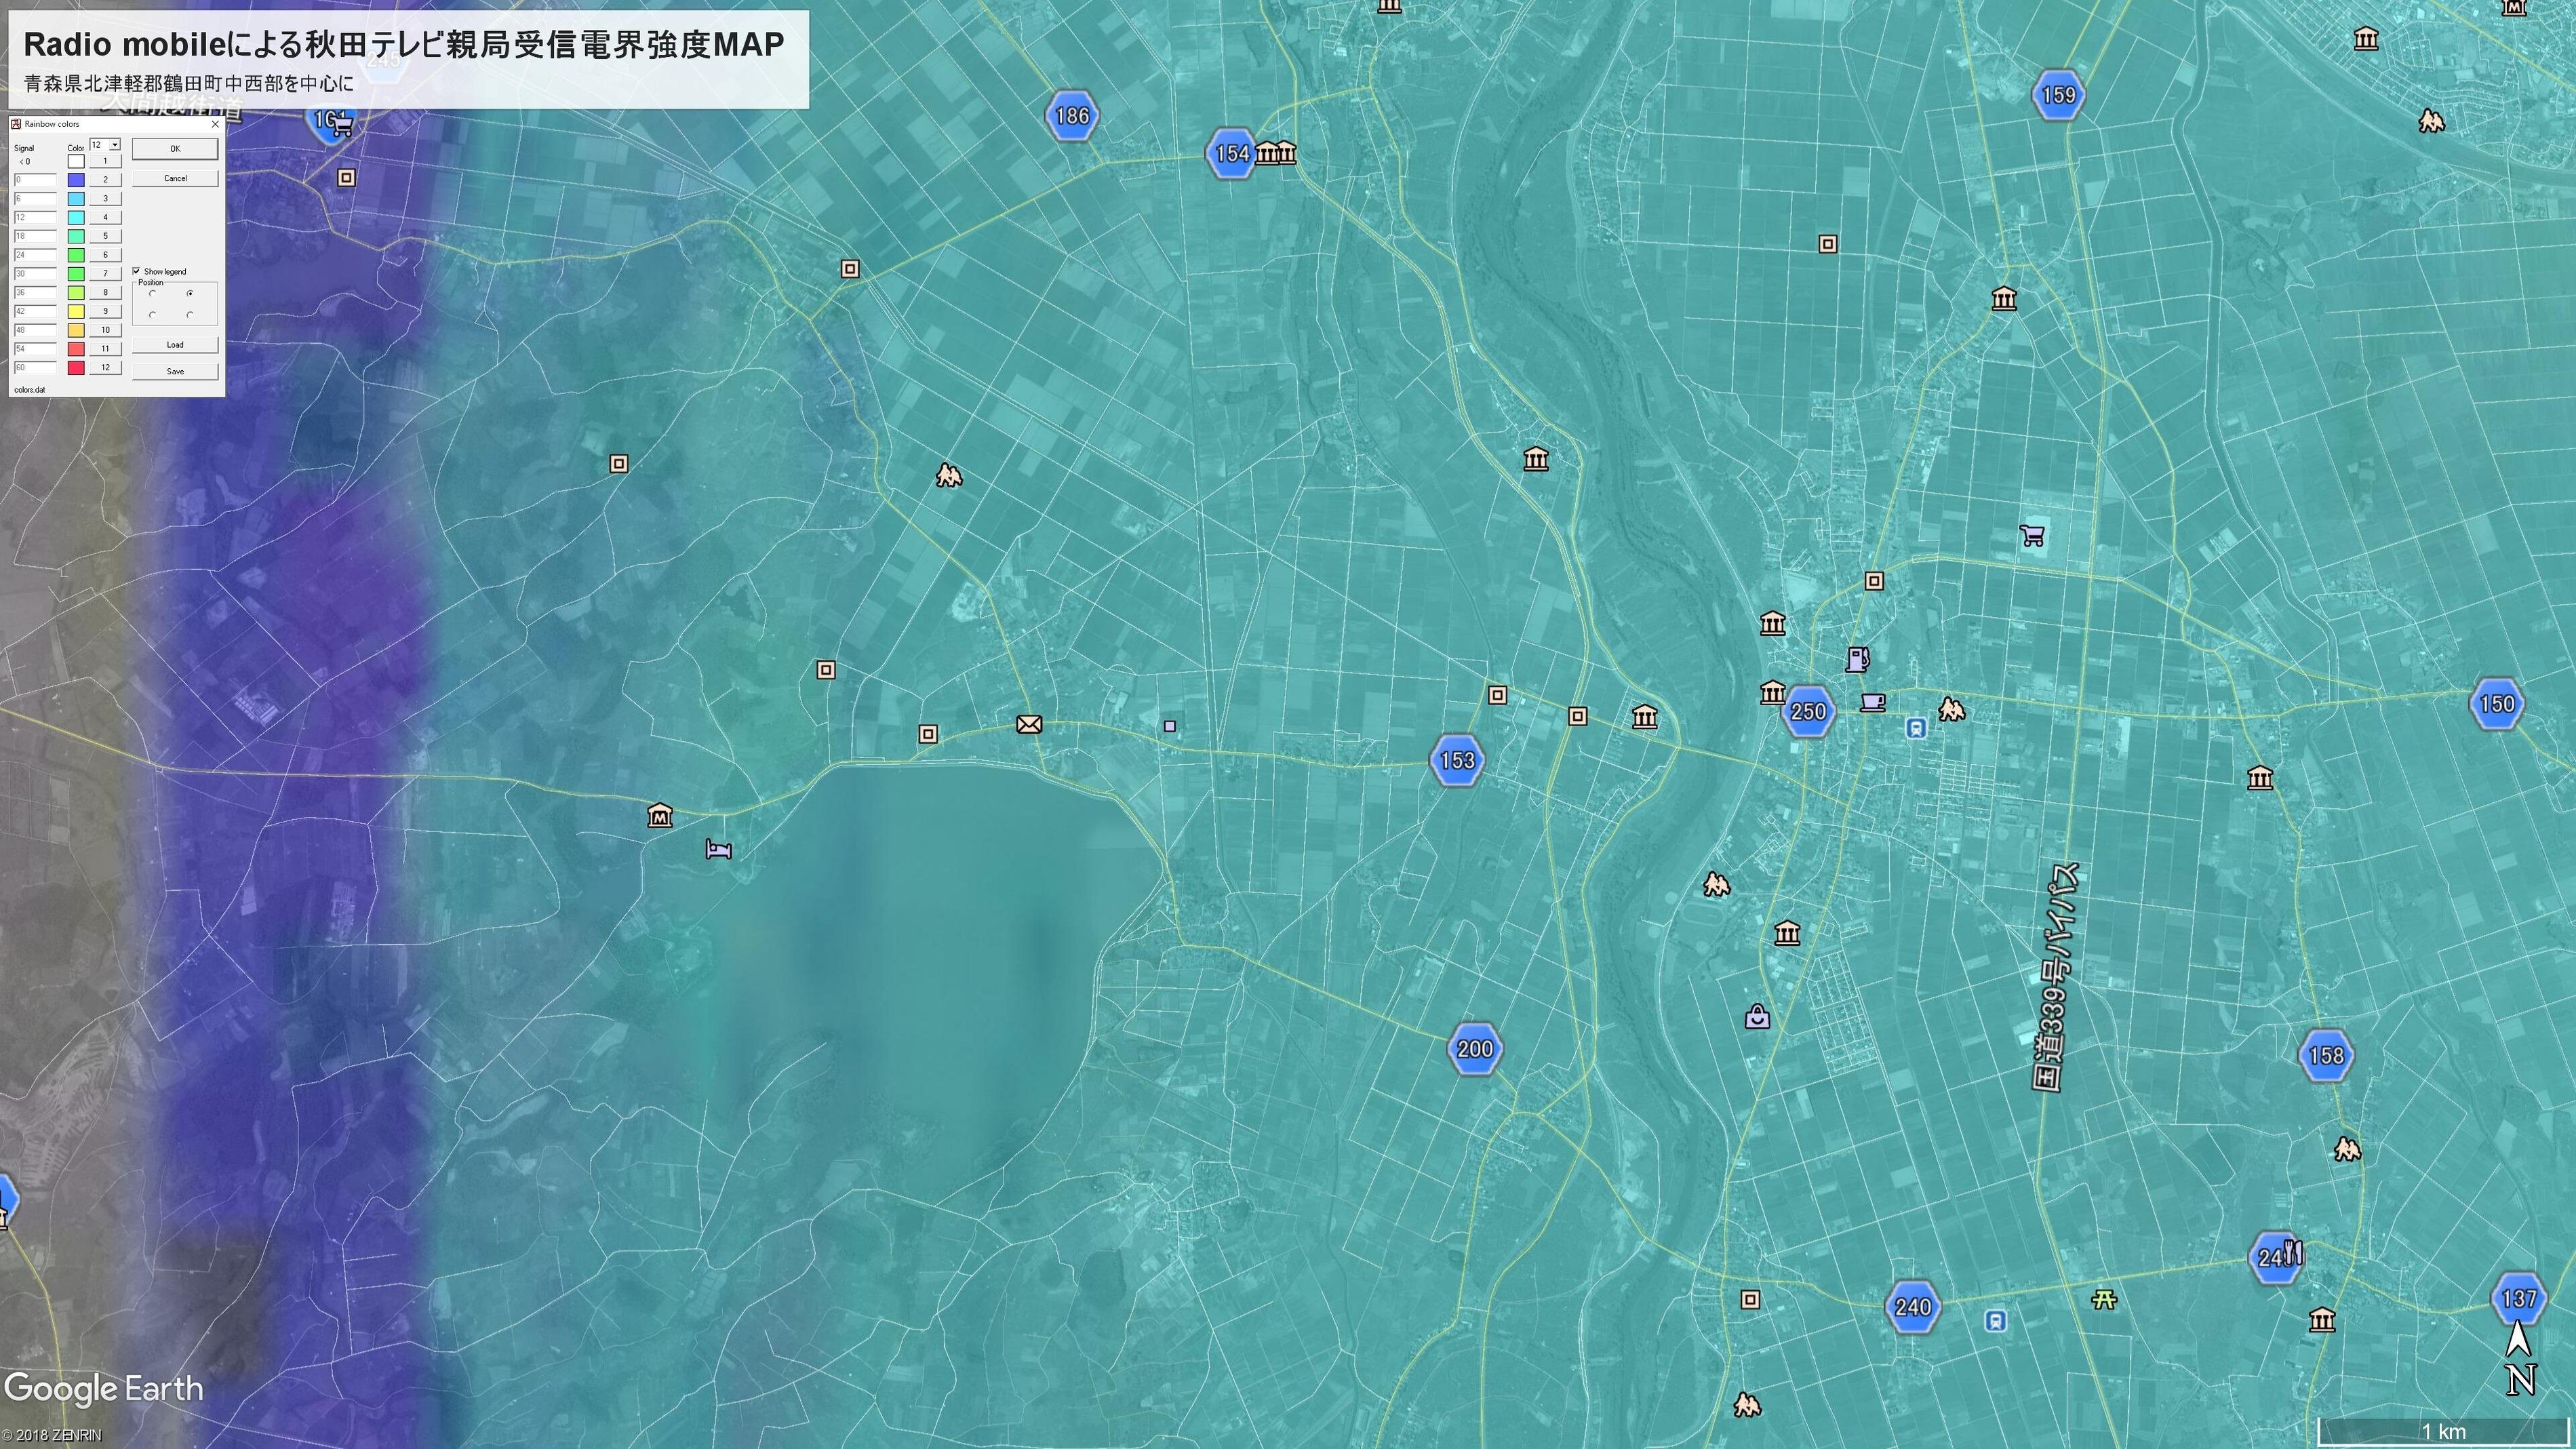 Radio mobileによる秋田テレビ親局受信電界強度MAP